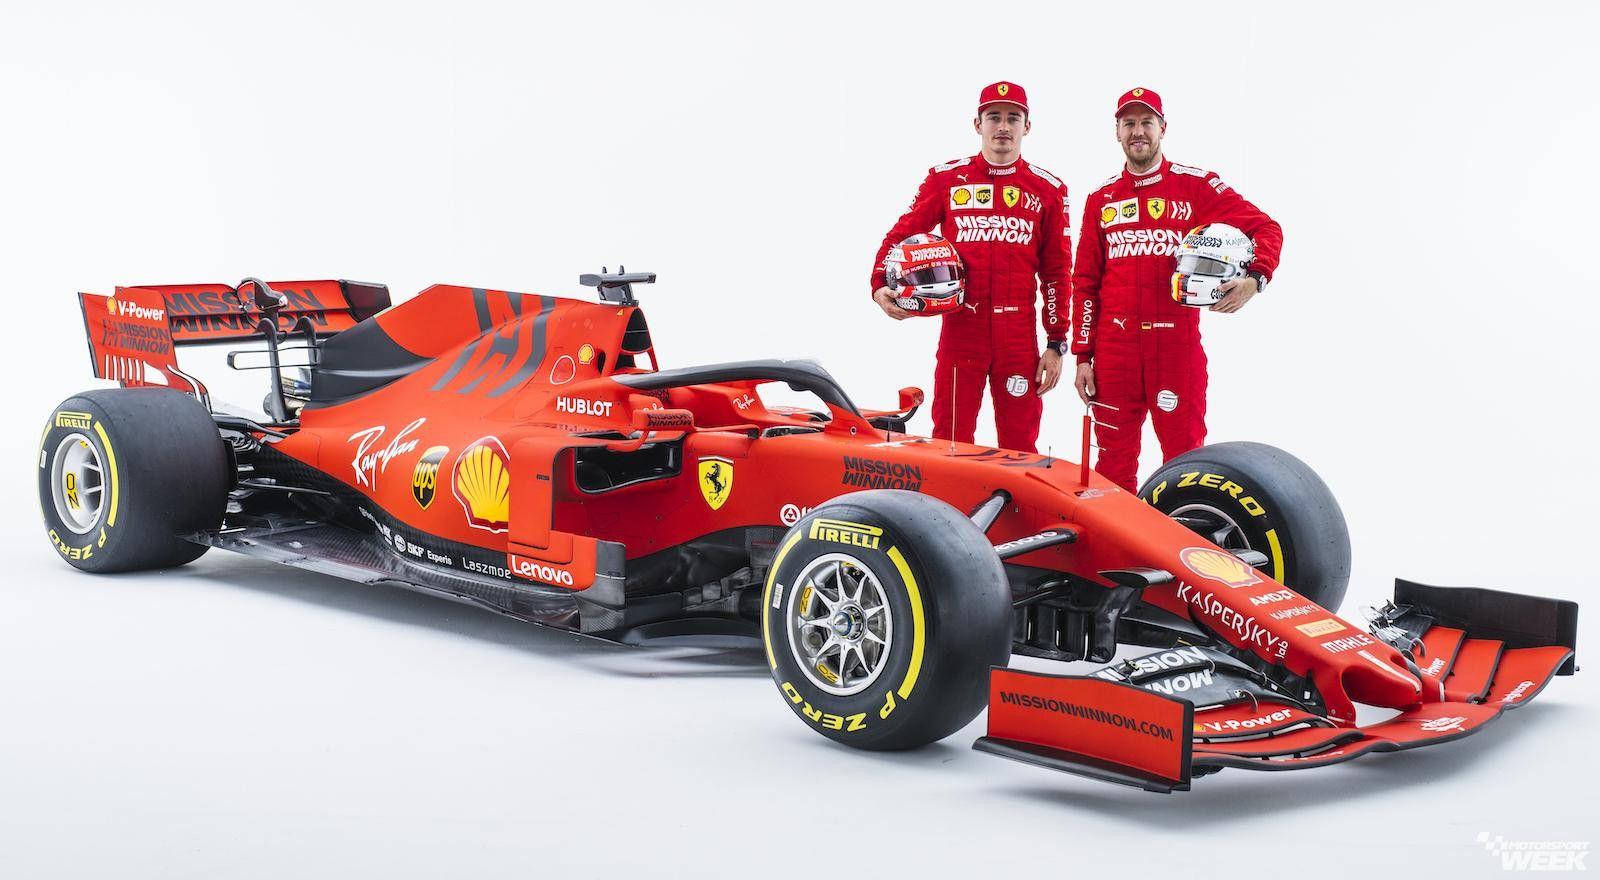 2020 Ferrari F1 Price En 2020 Formula 1 Autos Transporte